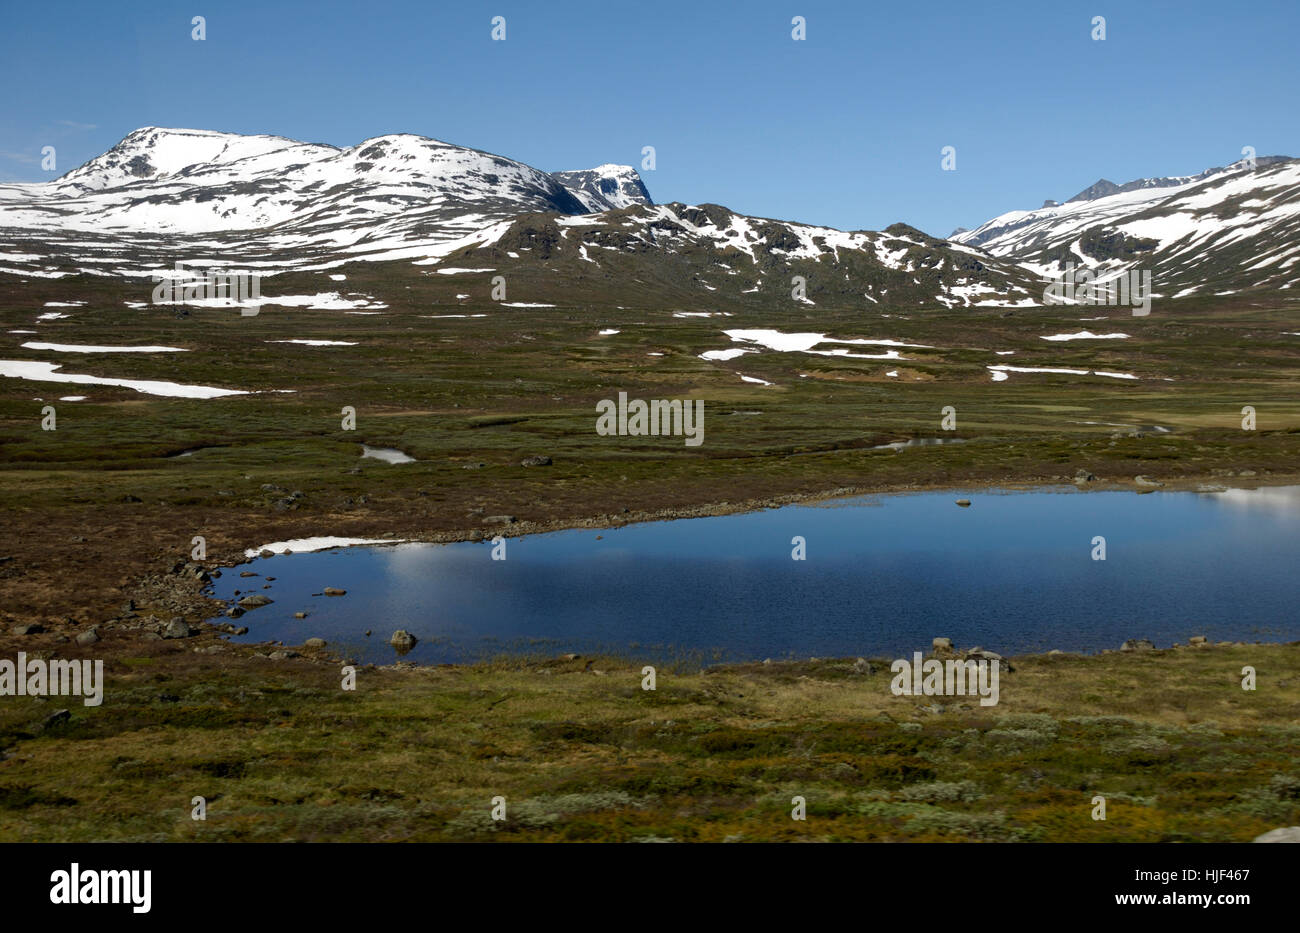 valdresflya in jotunheimen - Stock Image